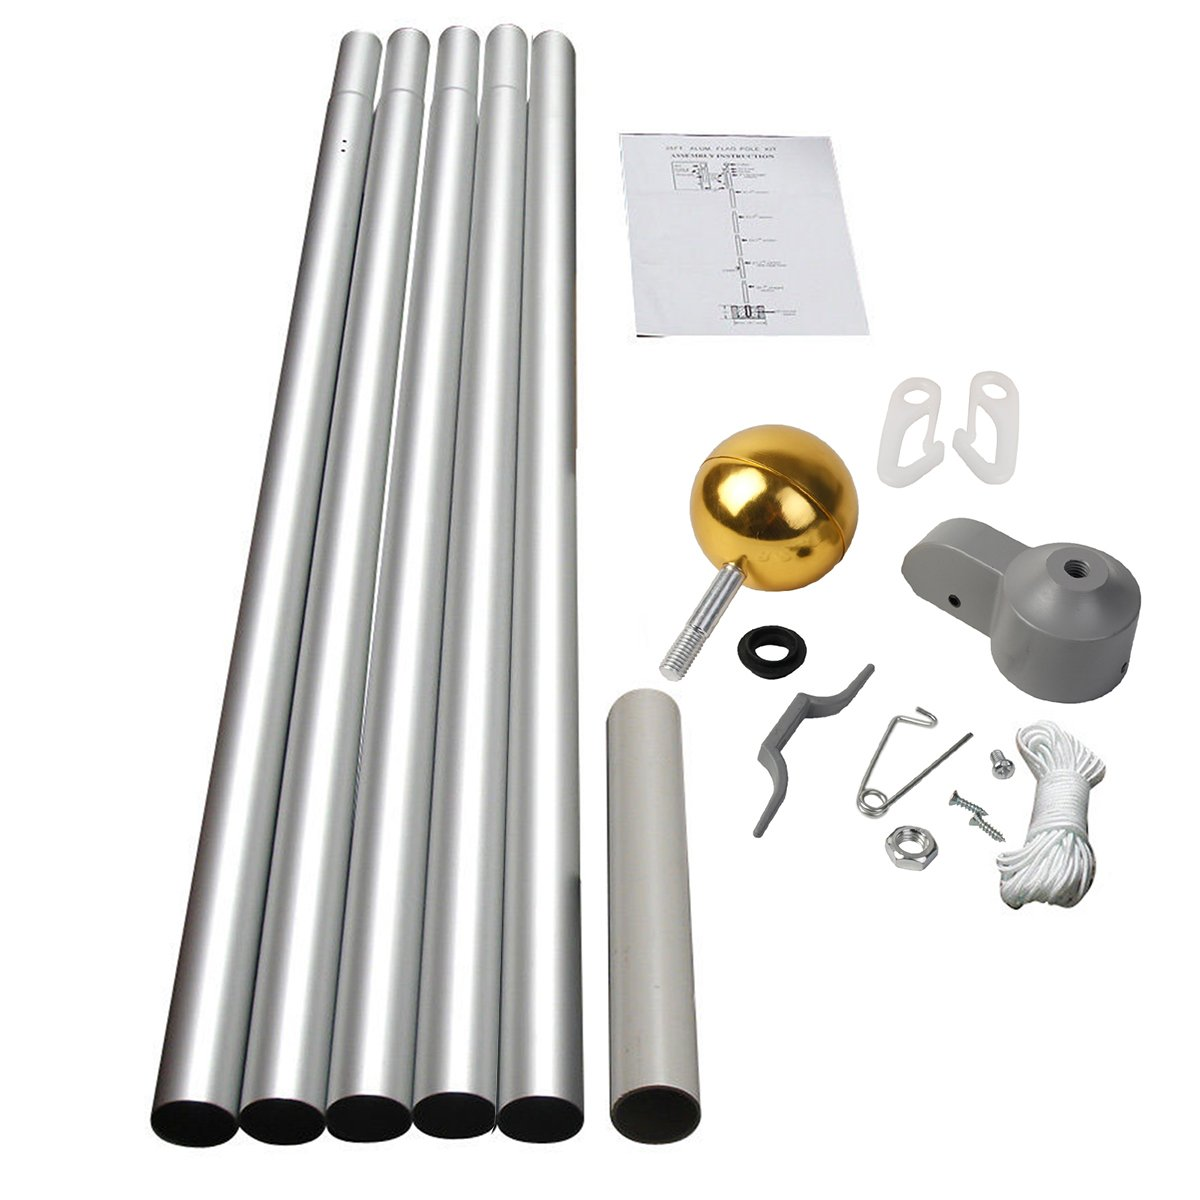 Costway 20FT Flag Pole Telescopic Aluminium 5 Joints Flagpole W/ 2 UK Flags & Gold Ball